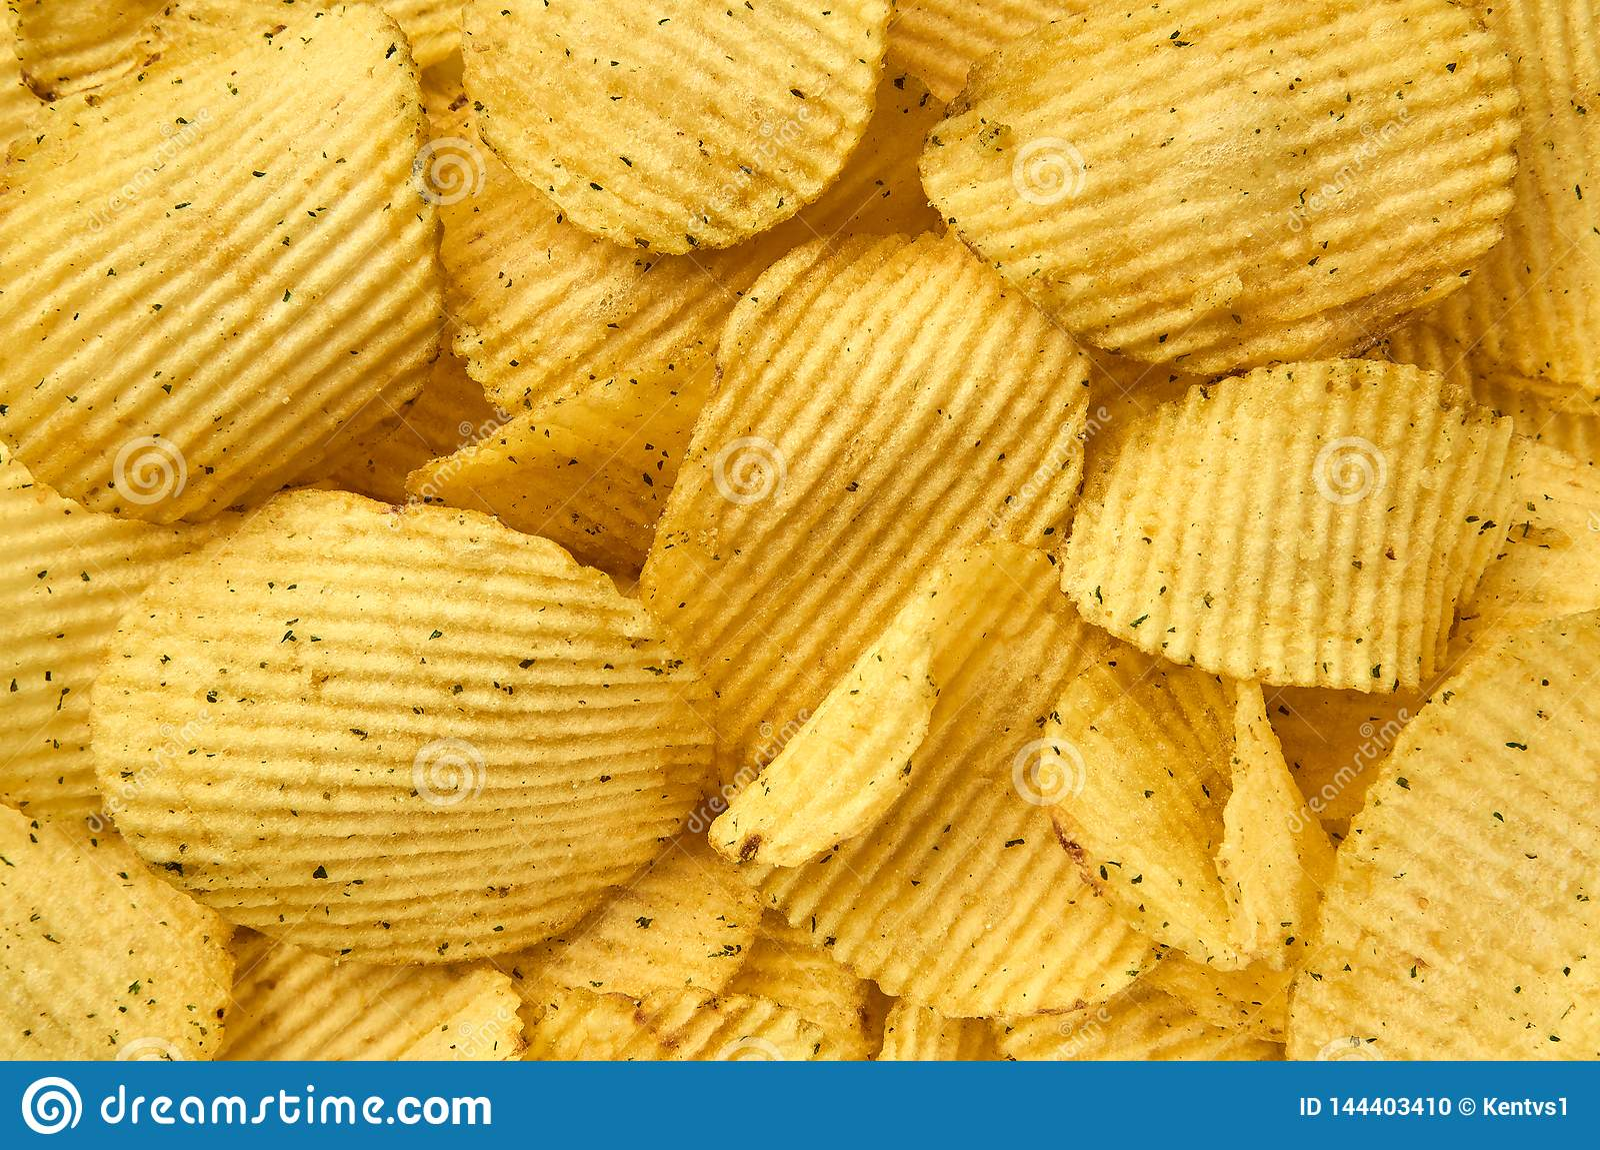 Background of juicy corrugated potato chips close-up